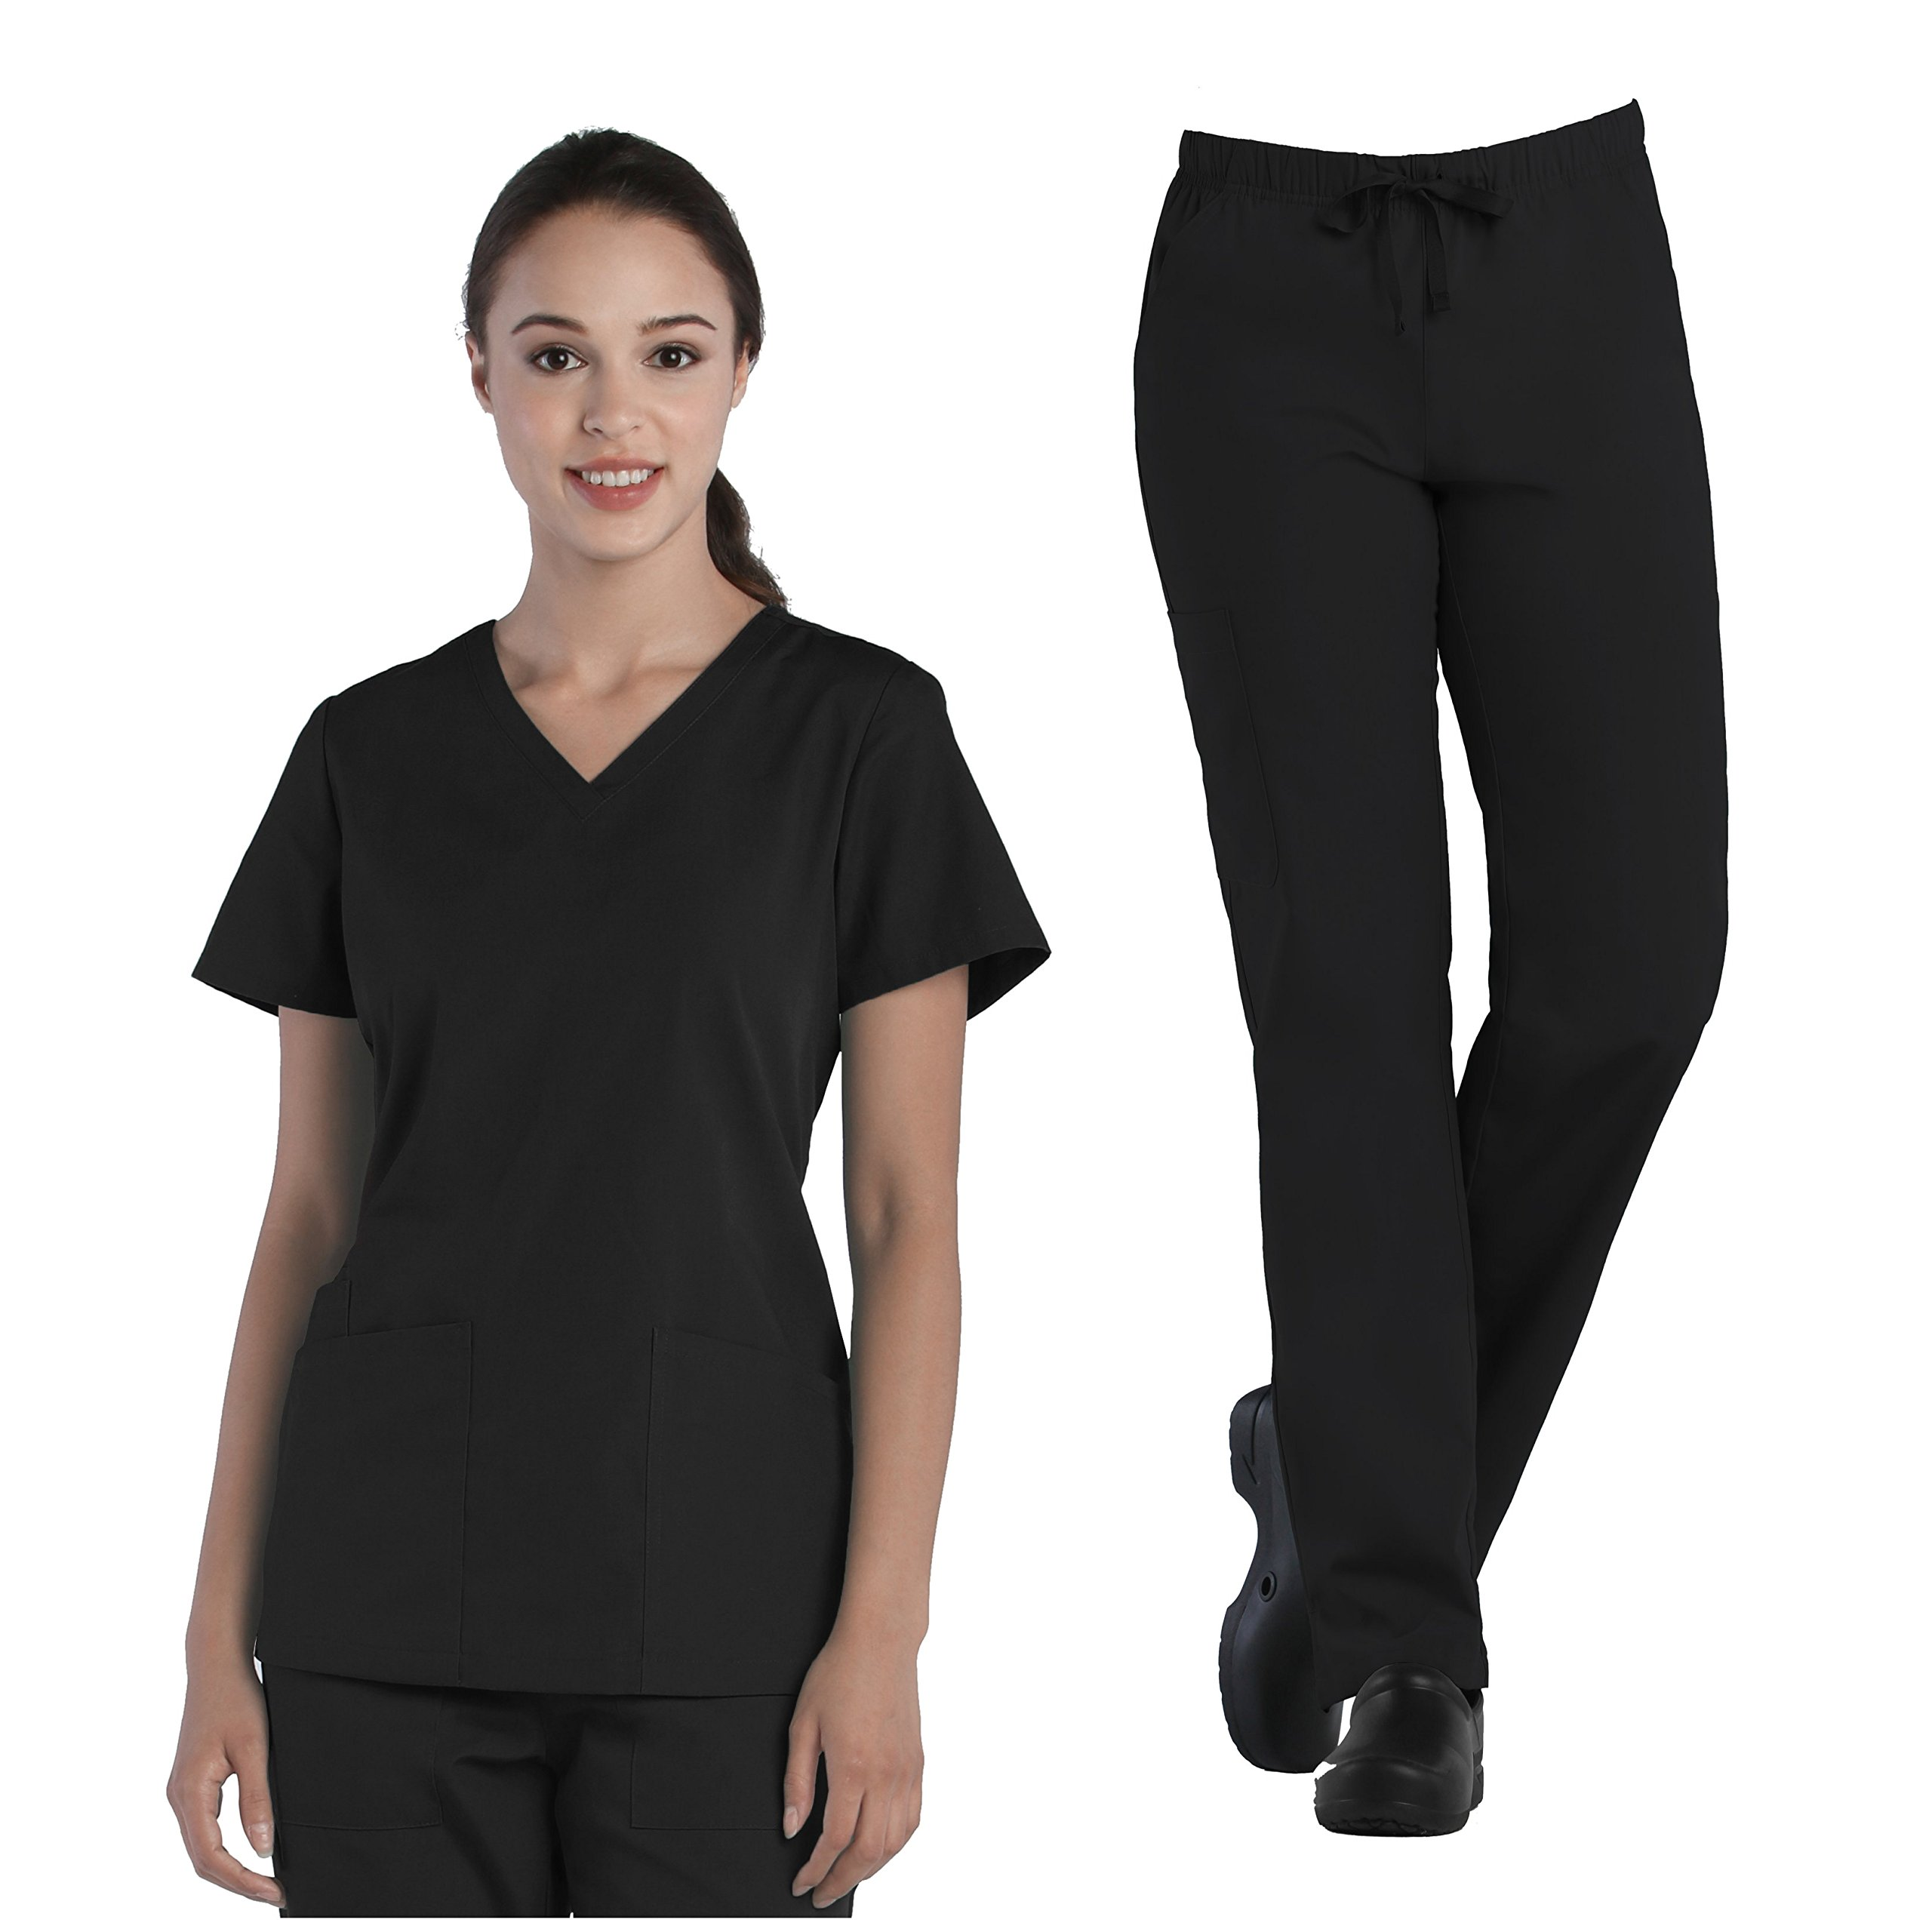 Tru Basic Womens V-Neck Top 10102 & Full Elastic Multi Pocket Cargo Pant 90103 Scrub Set (Black, Large Tall)